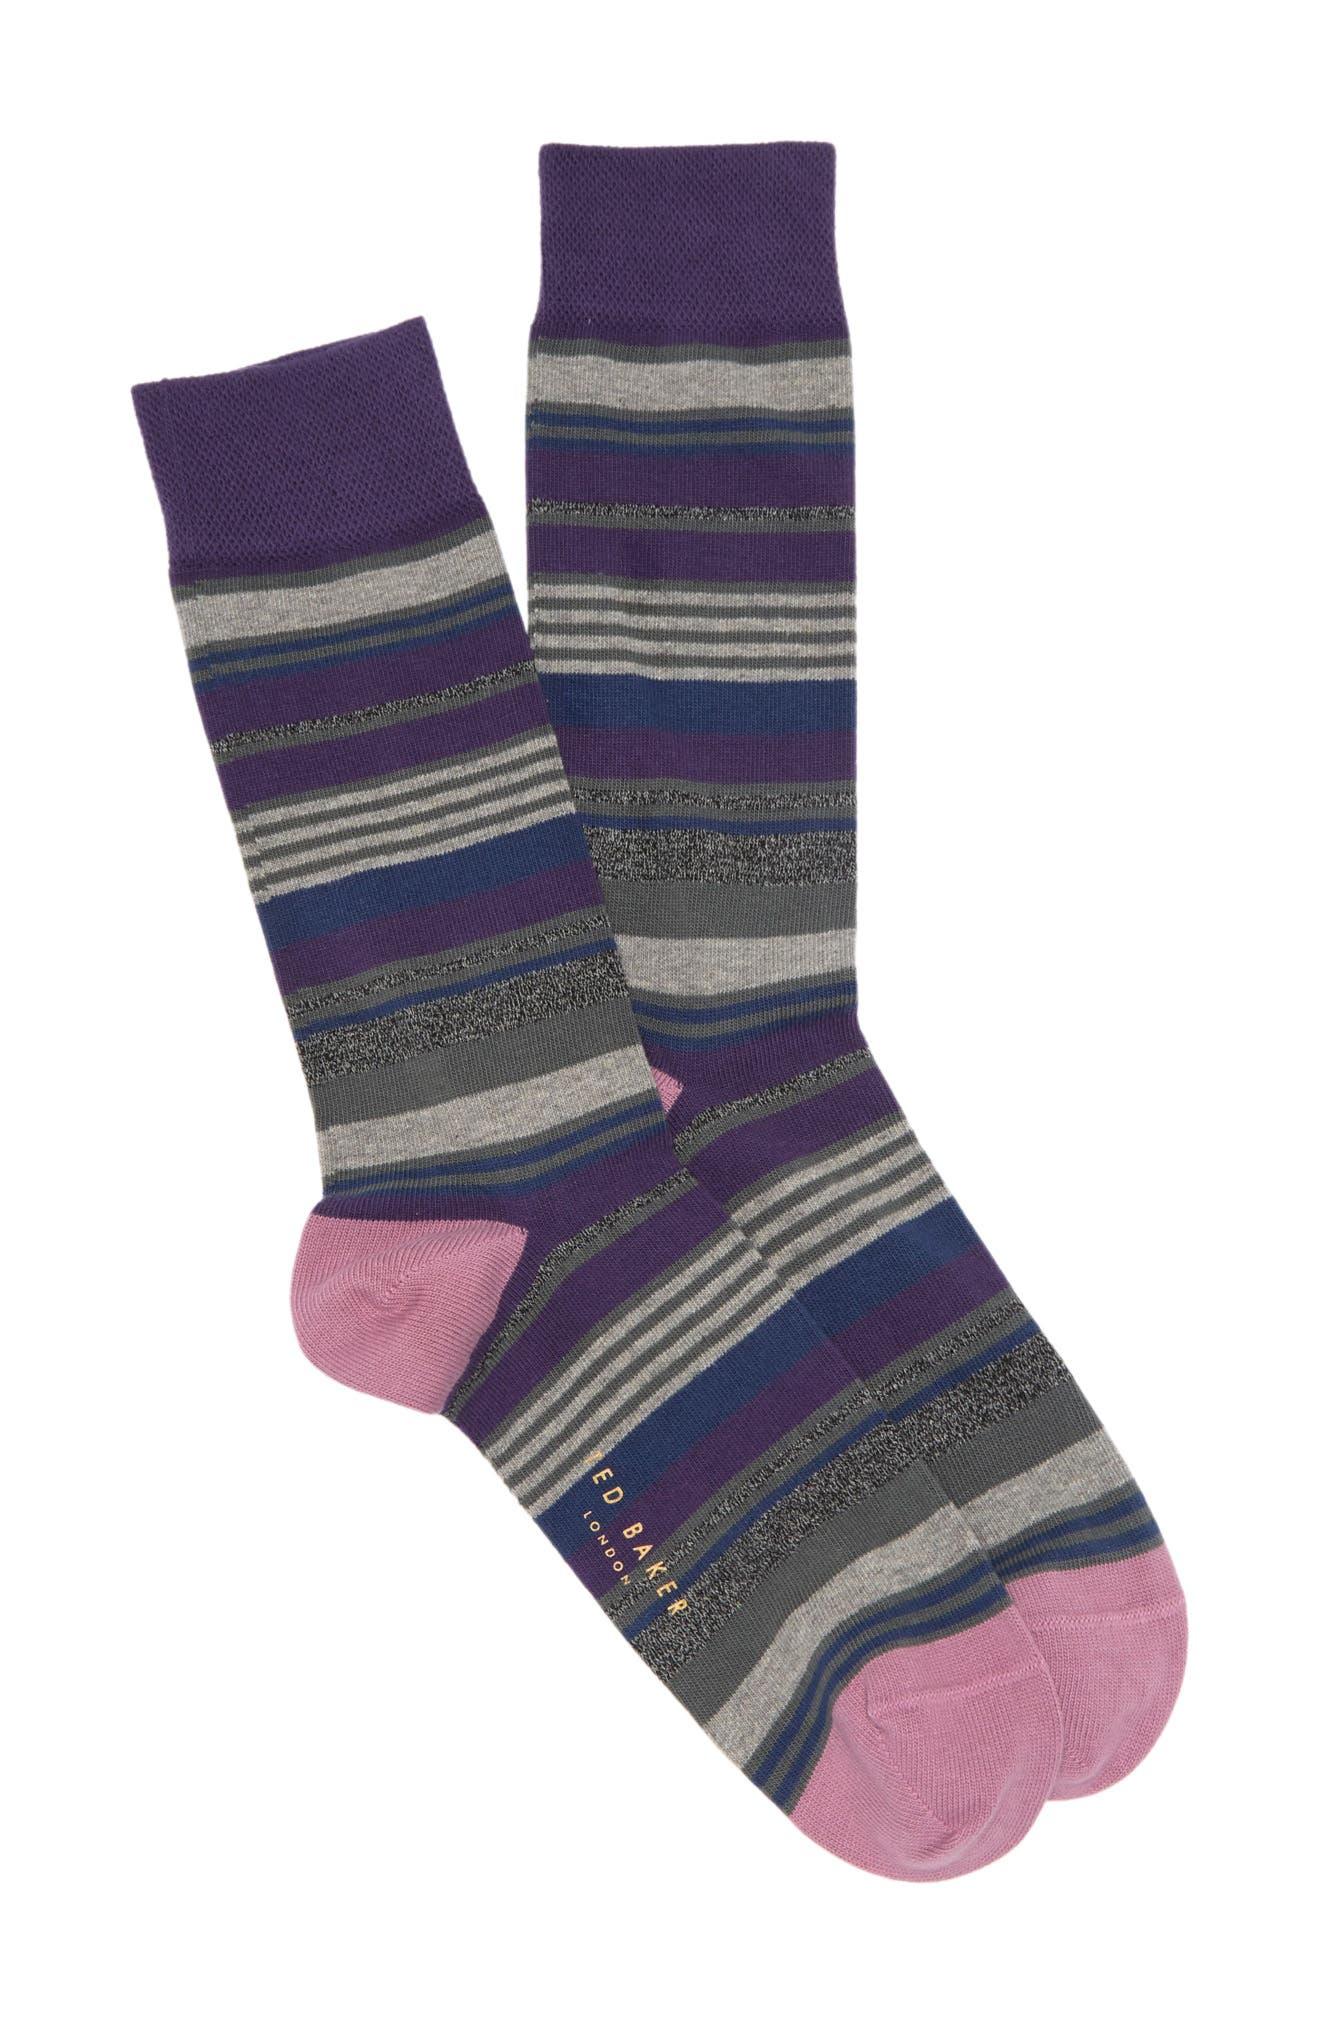 Image of Ted Baker London Hoopl Striped Socks